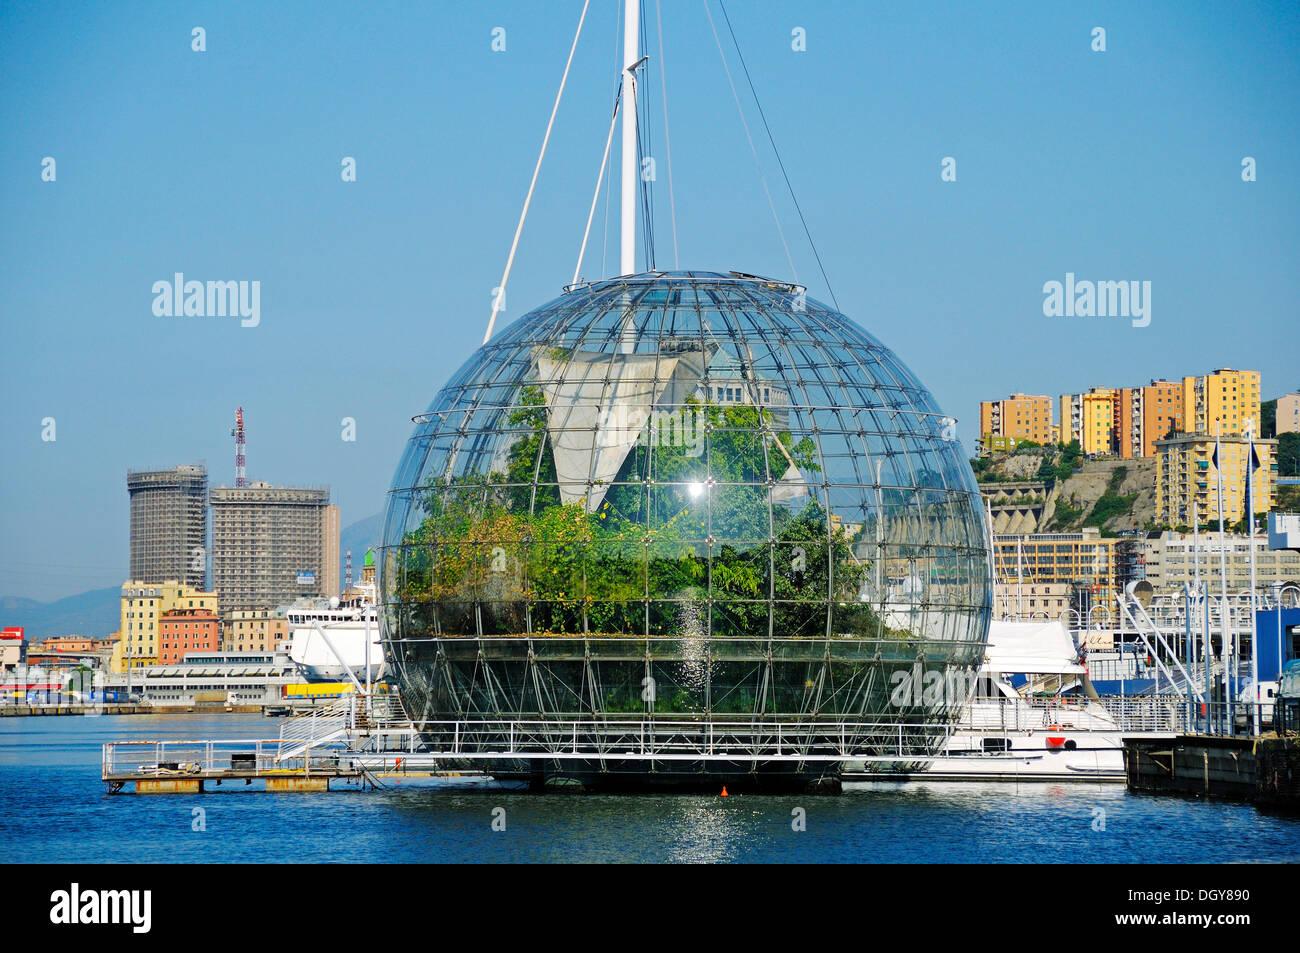 Biosfera glass sphere with a rainforest ecosystem, Porto Antico, Old Port, Genoa, Liguria, Italy, Europe - Stock Image